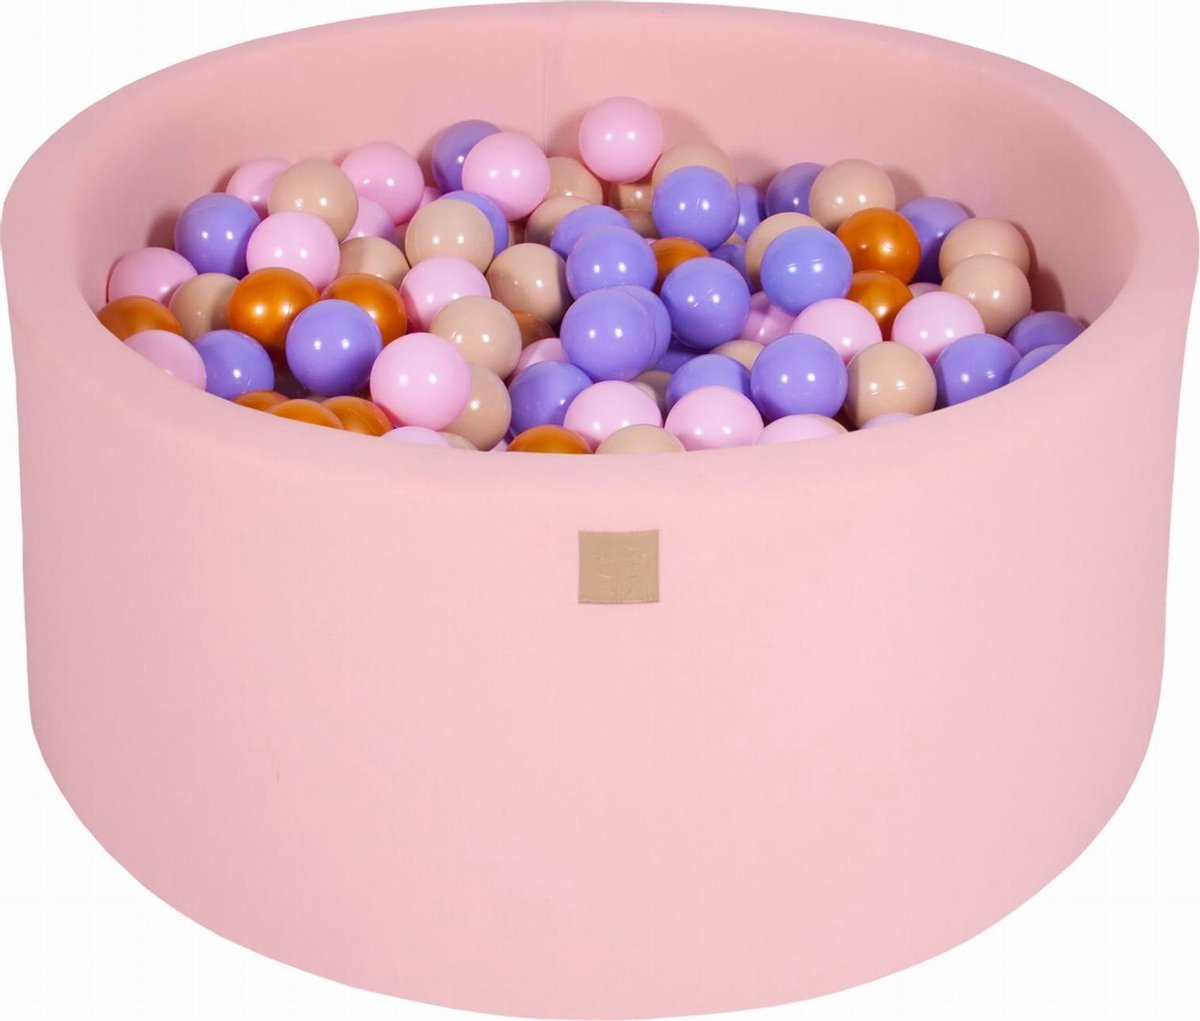 Ronde Ballenbak set incl 300 ballen 90x40cm - Licht Roze: Goud, Beige, Roze, Lila